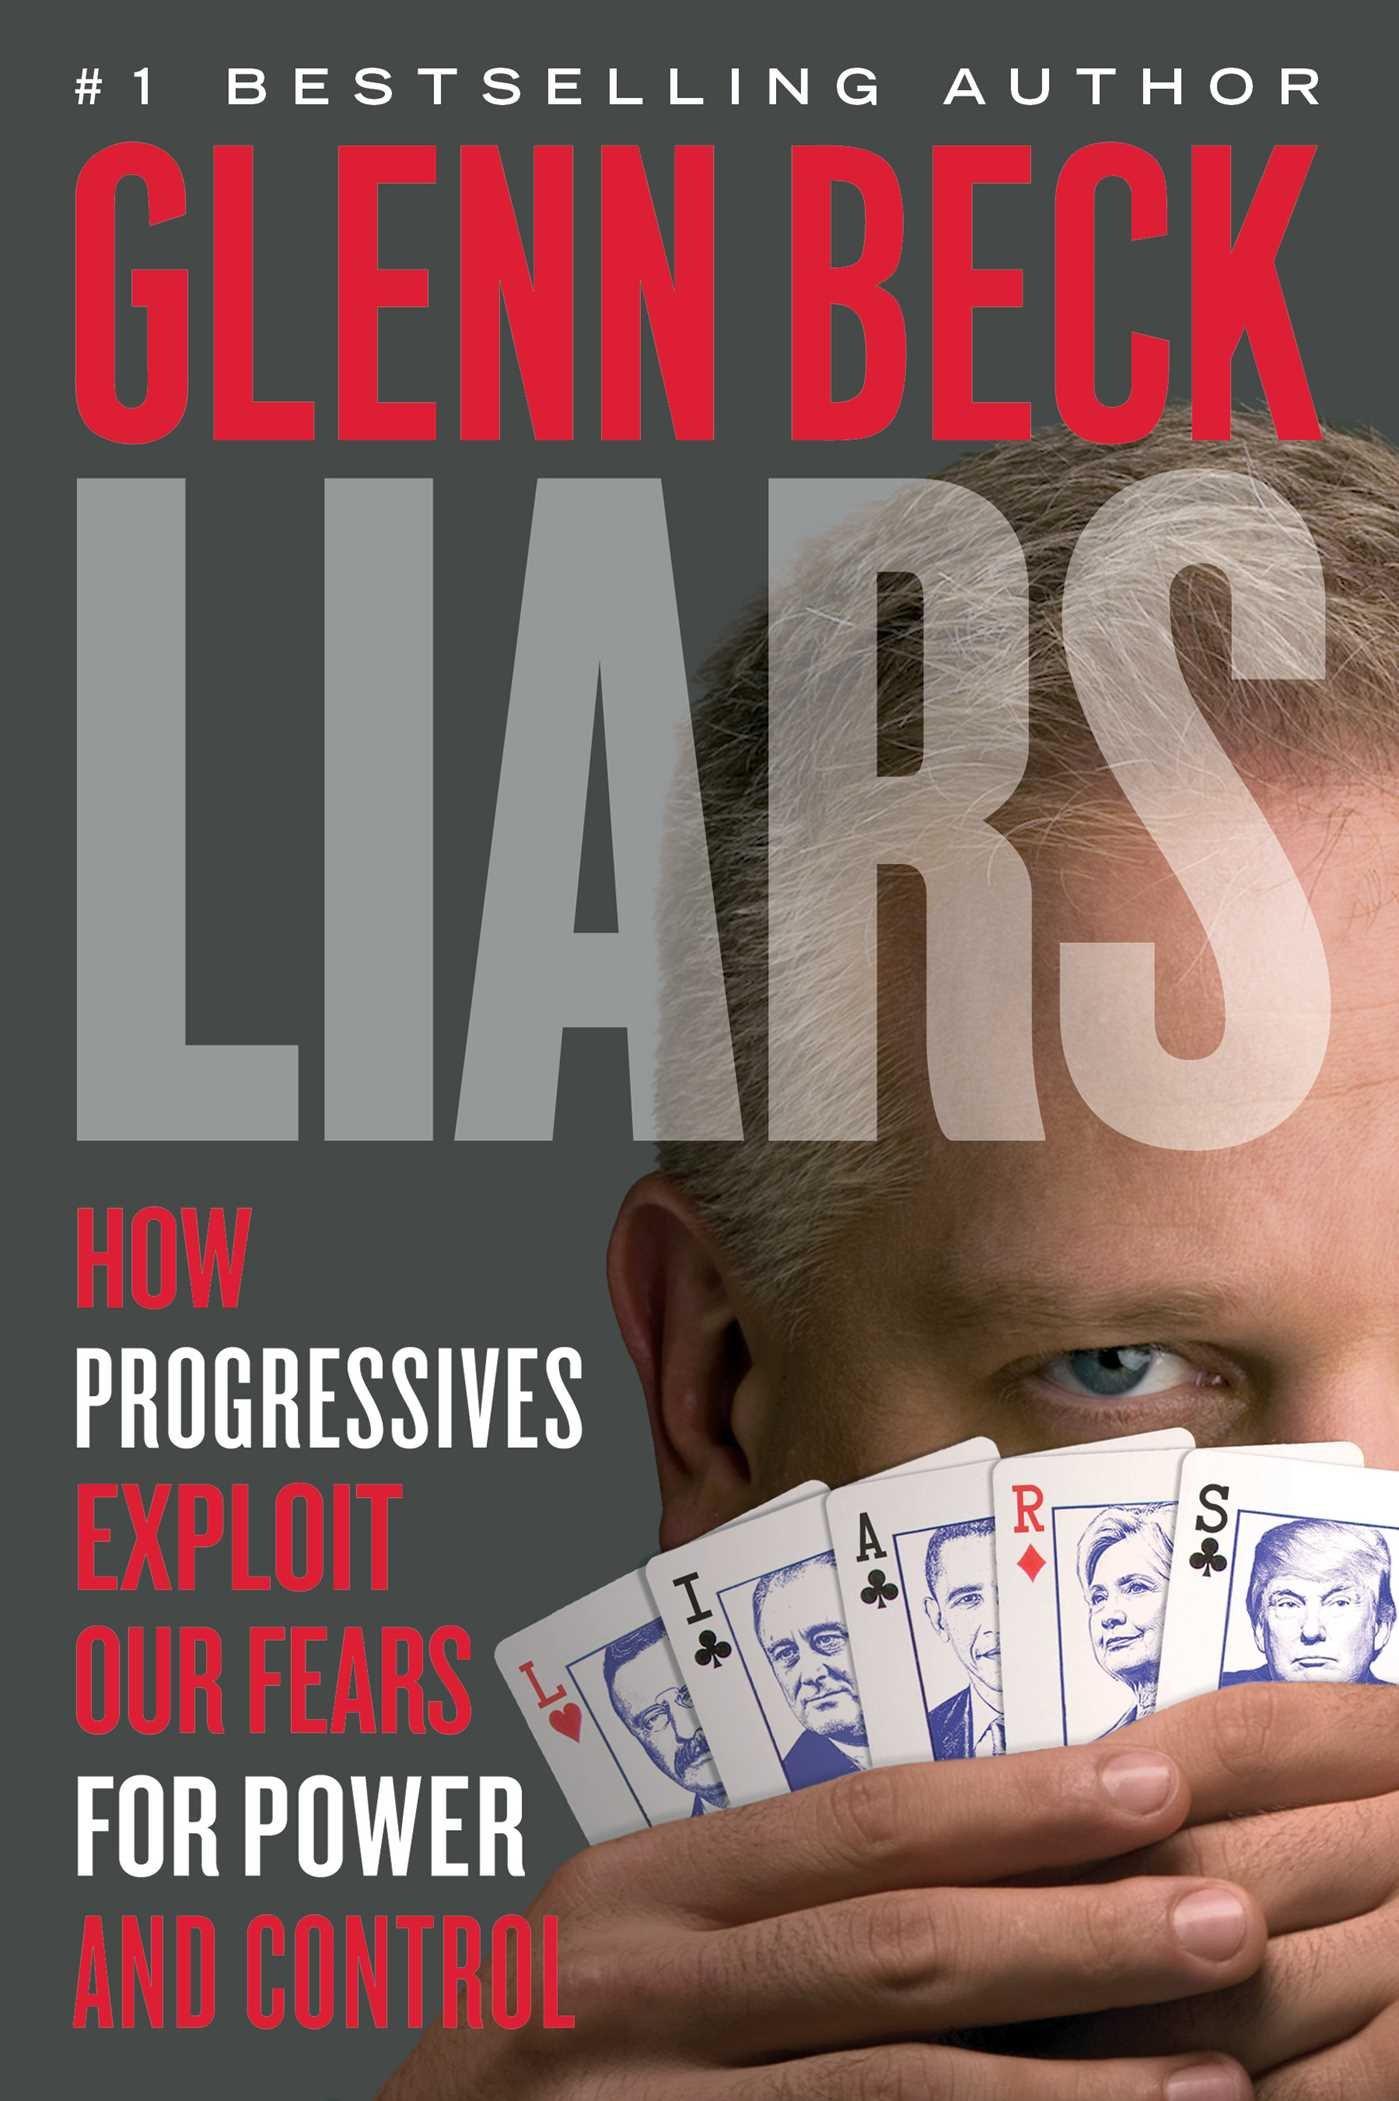 Liars How Progressives Exploit Our Fears for Power and Control Glenn Beck 9781476798882 Amazon.com Books  sc 1 st  Amazon.com & Liars: How Progressives Exploit Our Fears for Power and Control ...